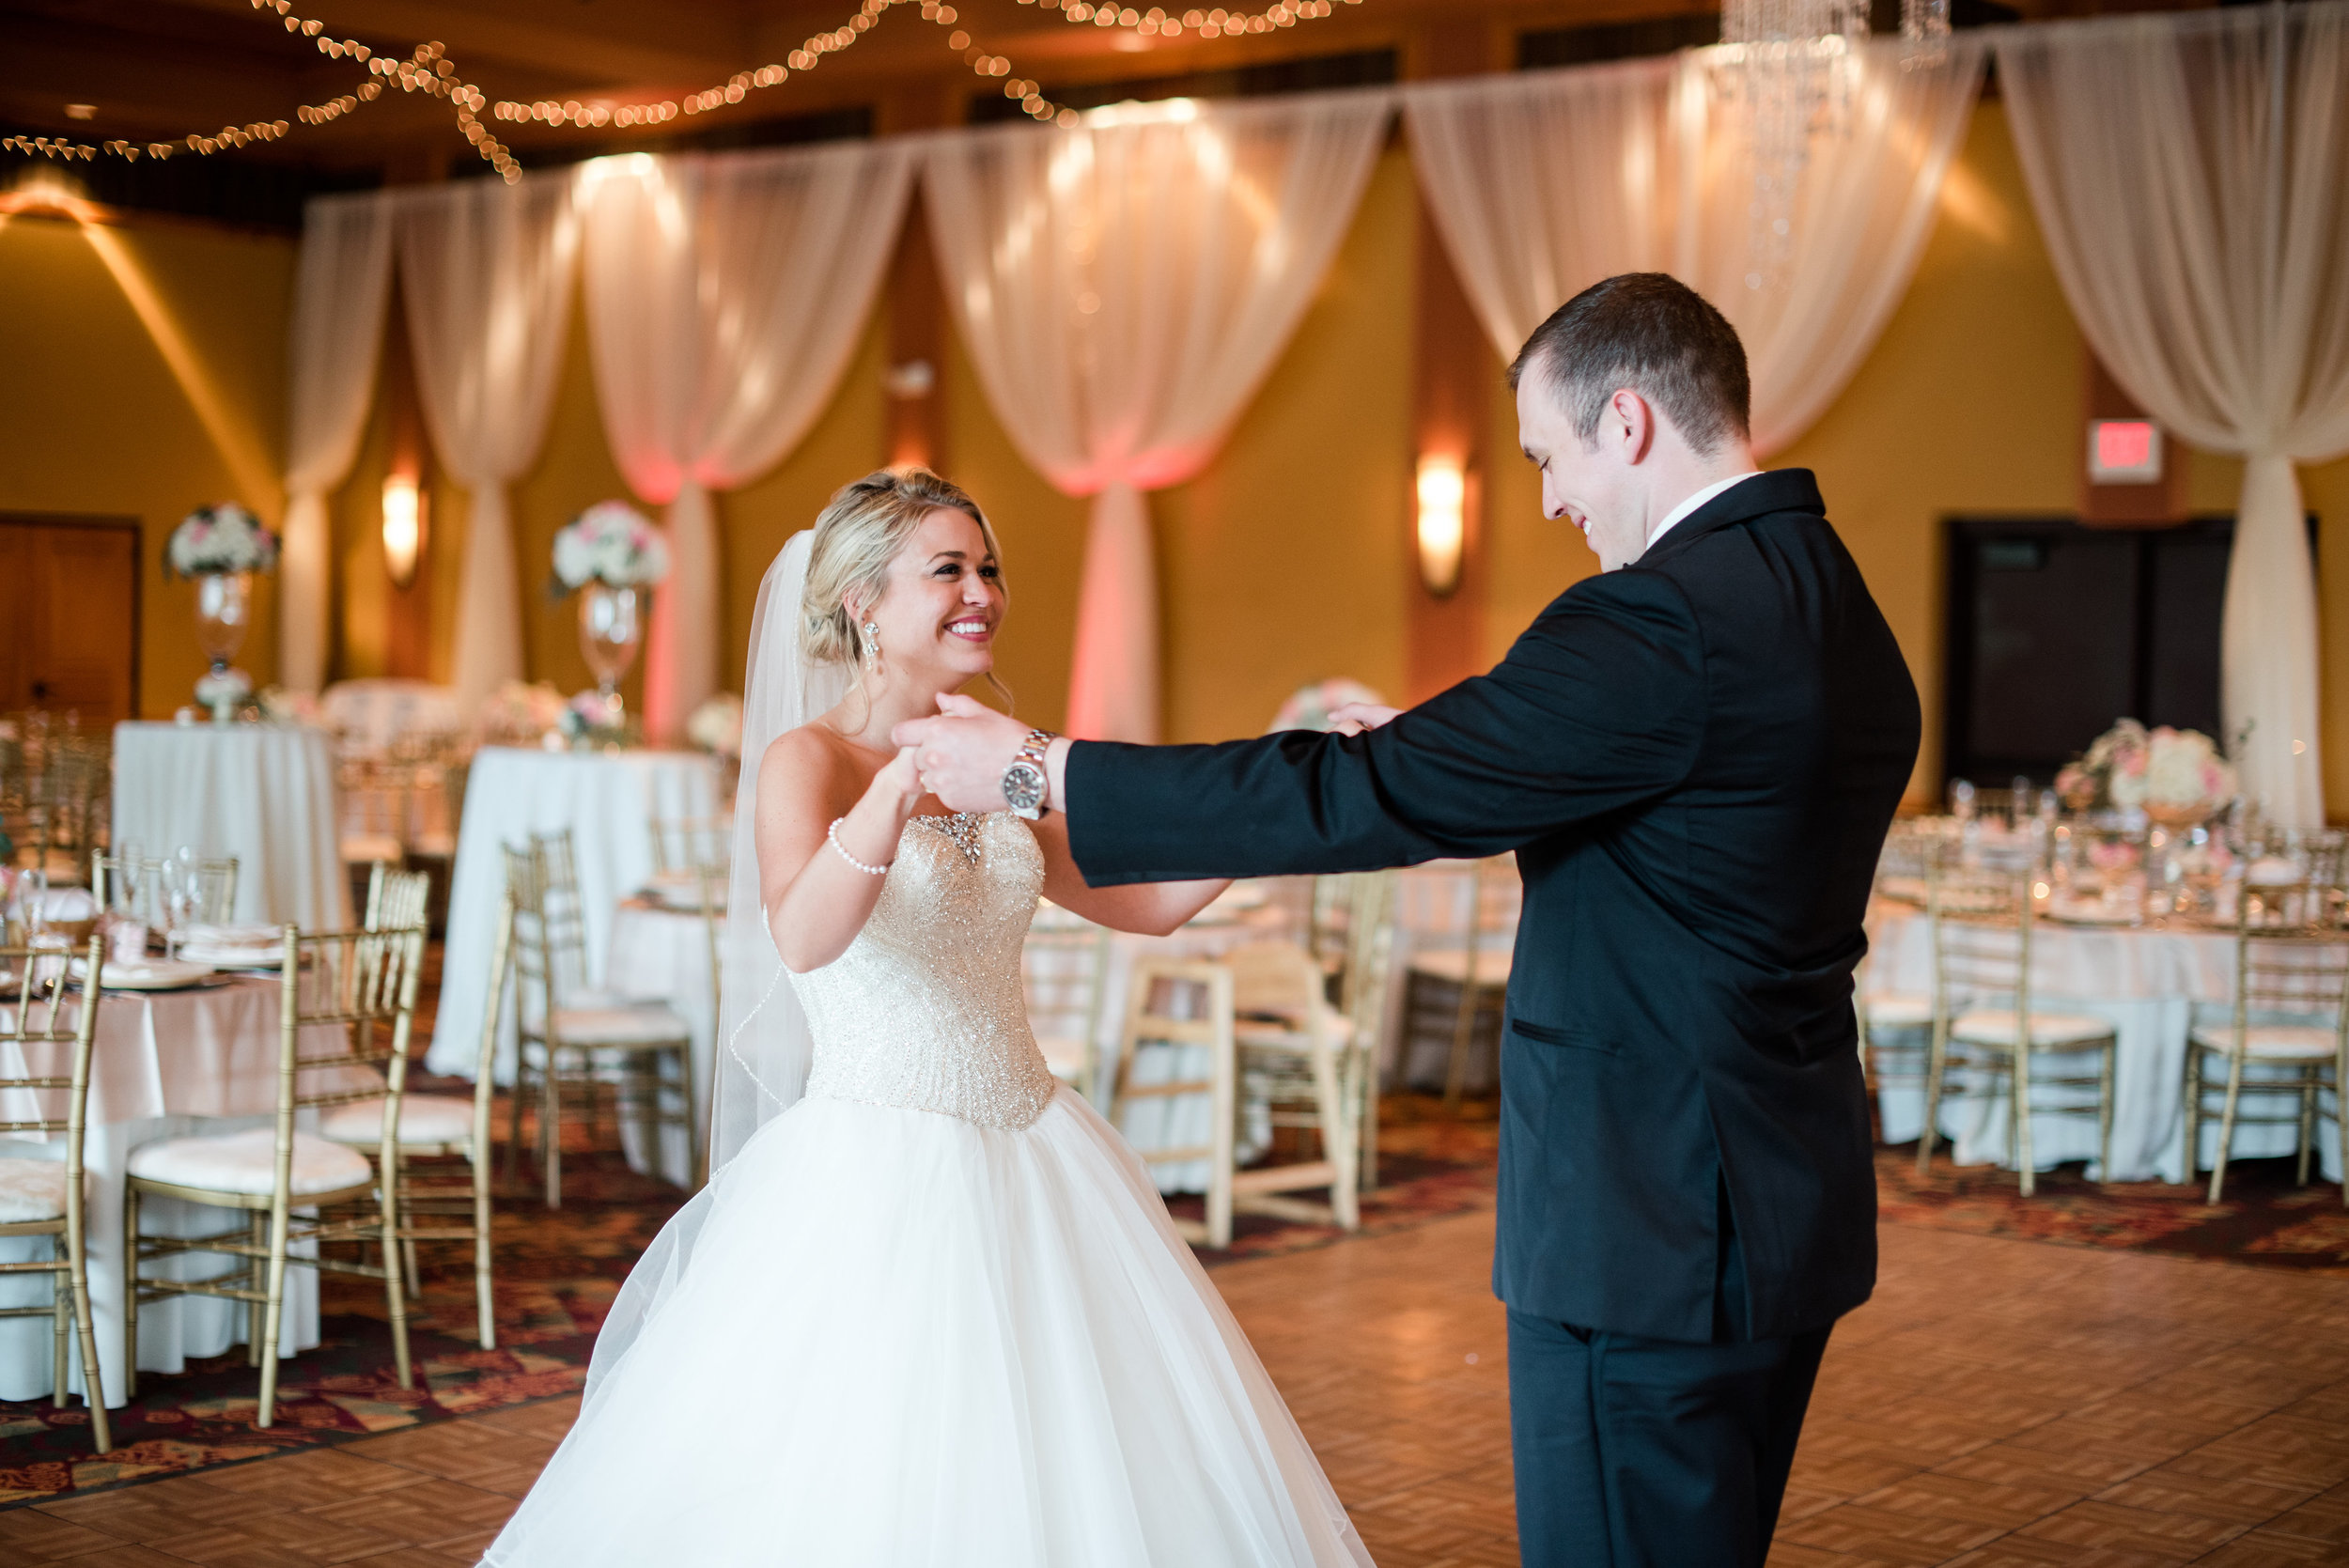 Chula Vista resort weddings - wedding planner wisconsin dells